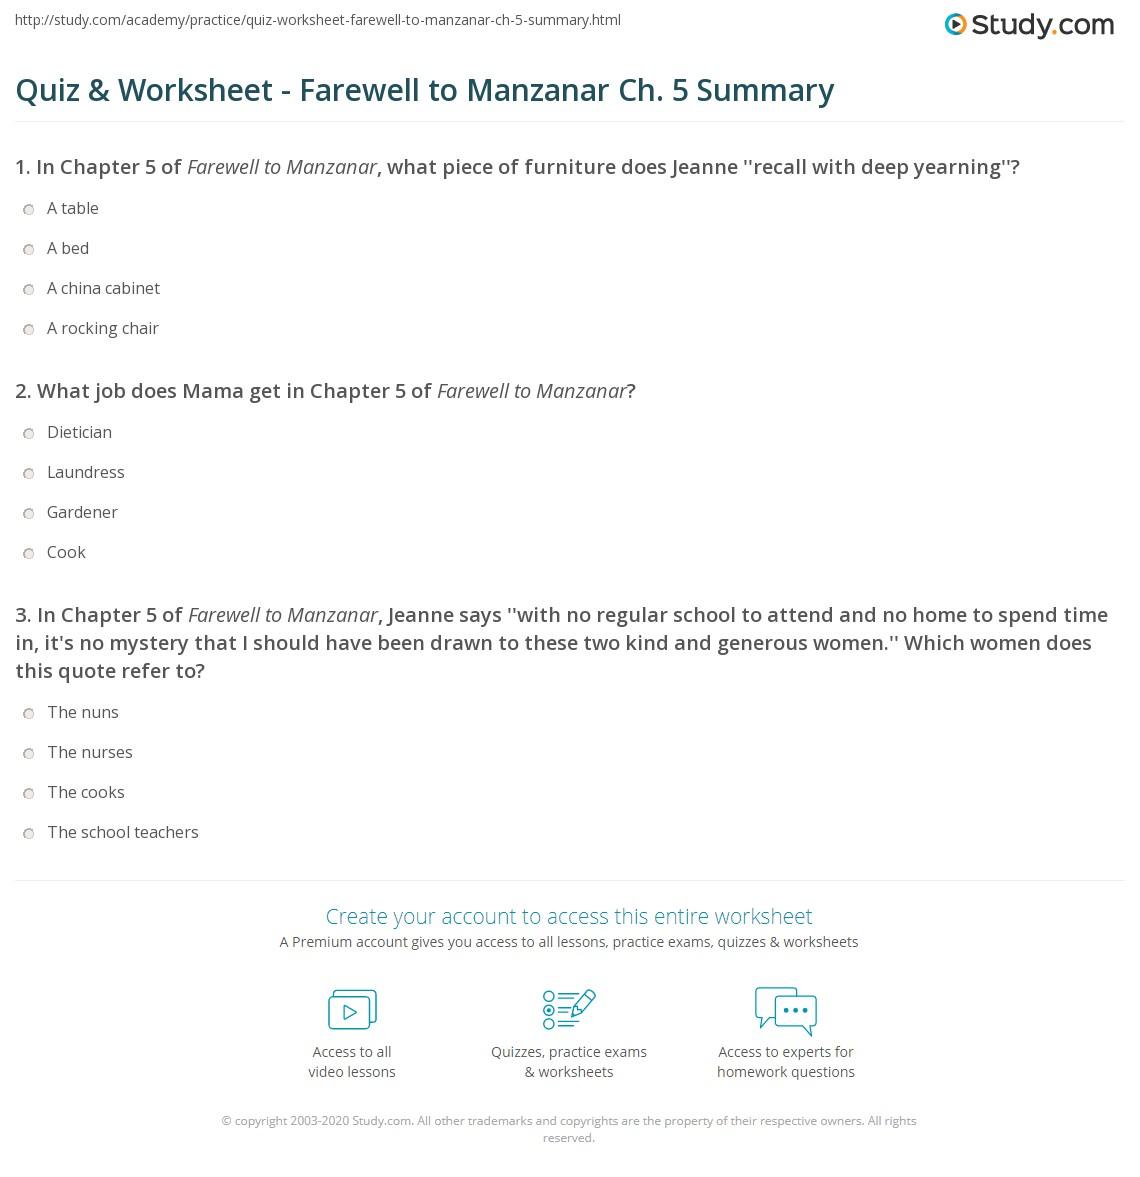 quiz worksheet farewell to manzanar ch 5 summary. Black Bedroom Furniture Sets. Home Design Ideas